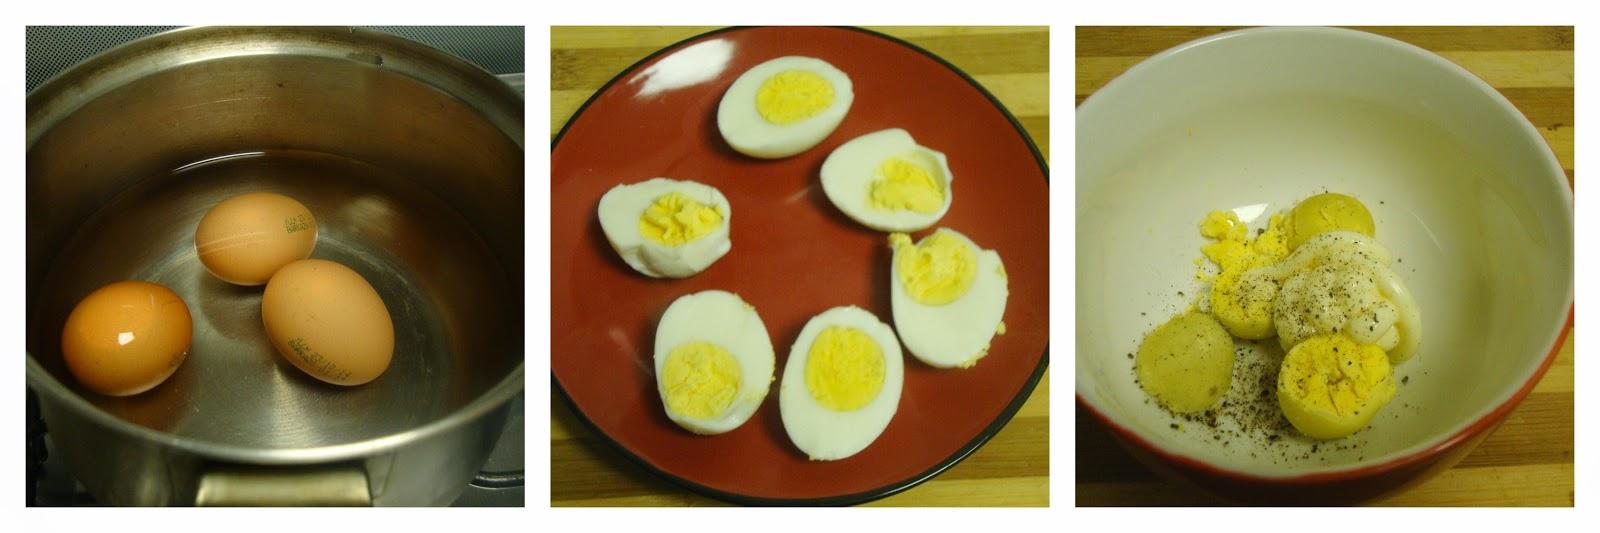 ... Deviled Eggs / Spooky Deviled Eggs / Deviled Eggs - Halloween Special